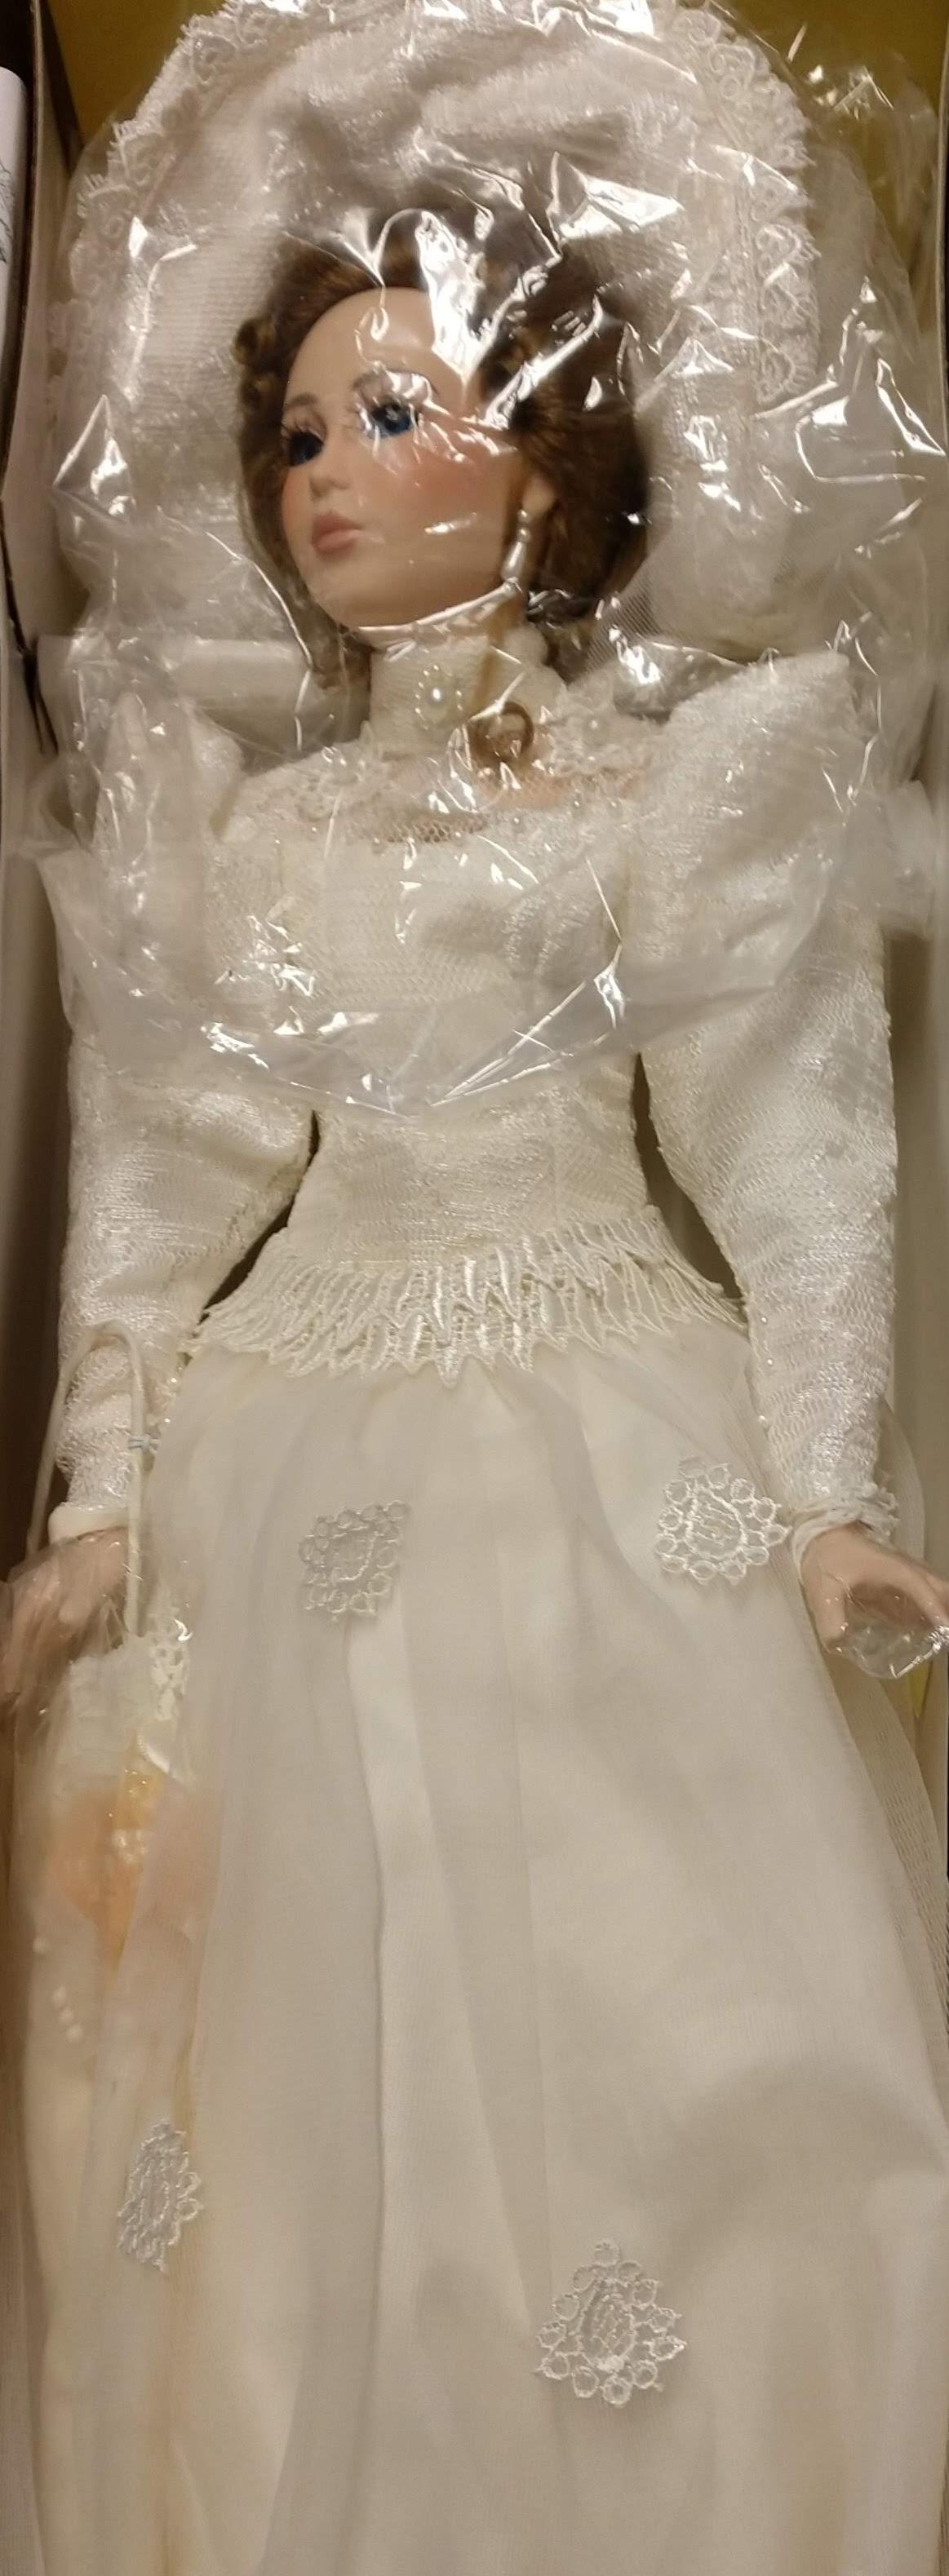 Seymour Mann Porcelain Doll.jpg